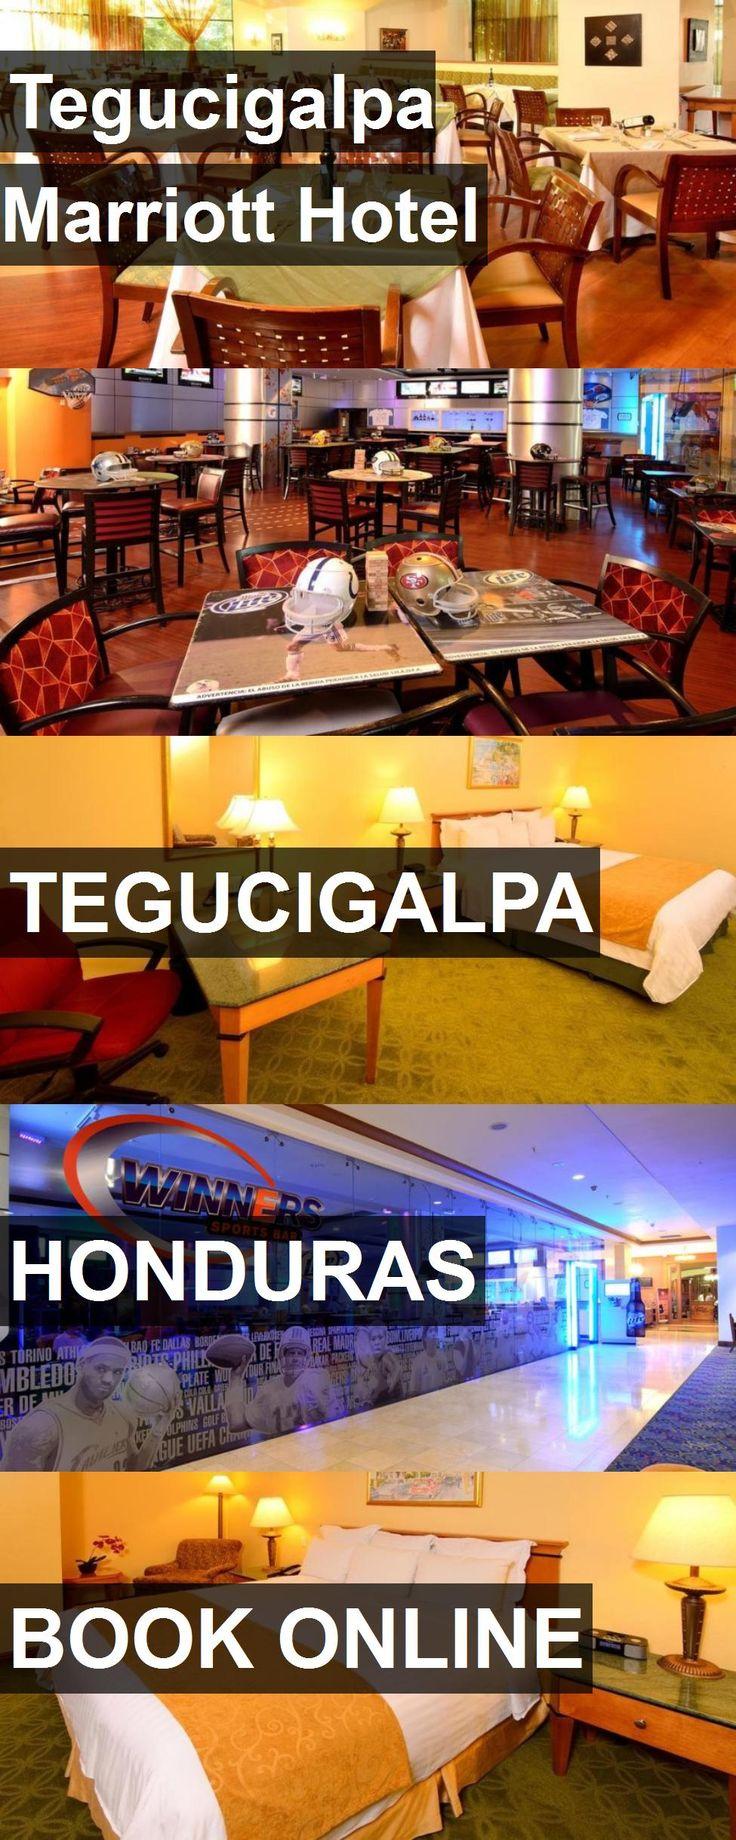 Tegucigalpa Marriott Hotel in Tegucigalpa, Honduras. For more information, photos, reviews and best prices please follow the link. #Honduras #Tegucigalpa #travel #vacation #hotel